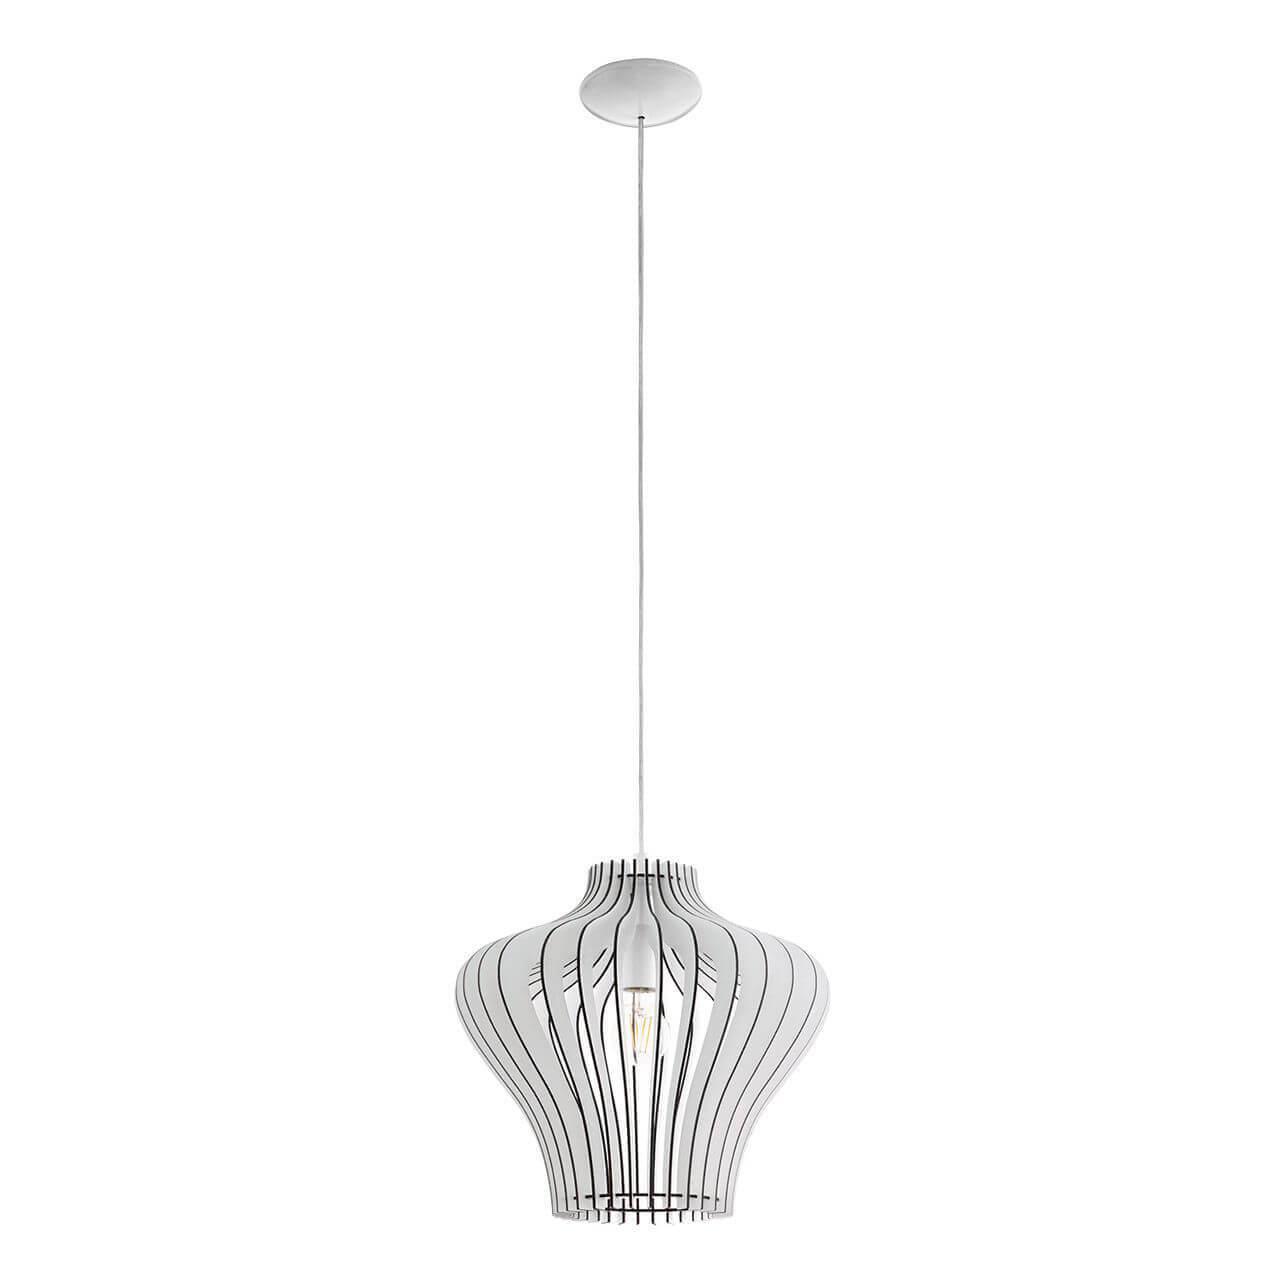 Светильник Eglo 95253 Cossano настольная лампа eglo 94956 cossano